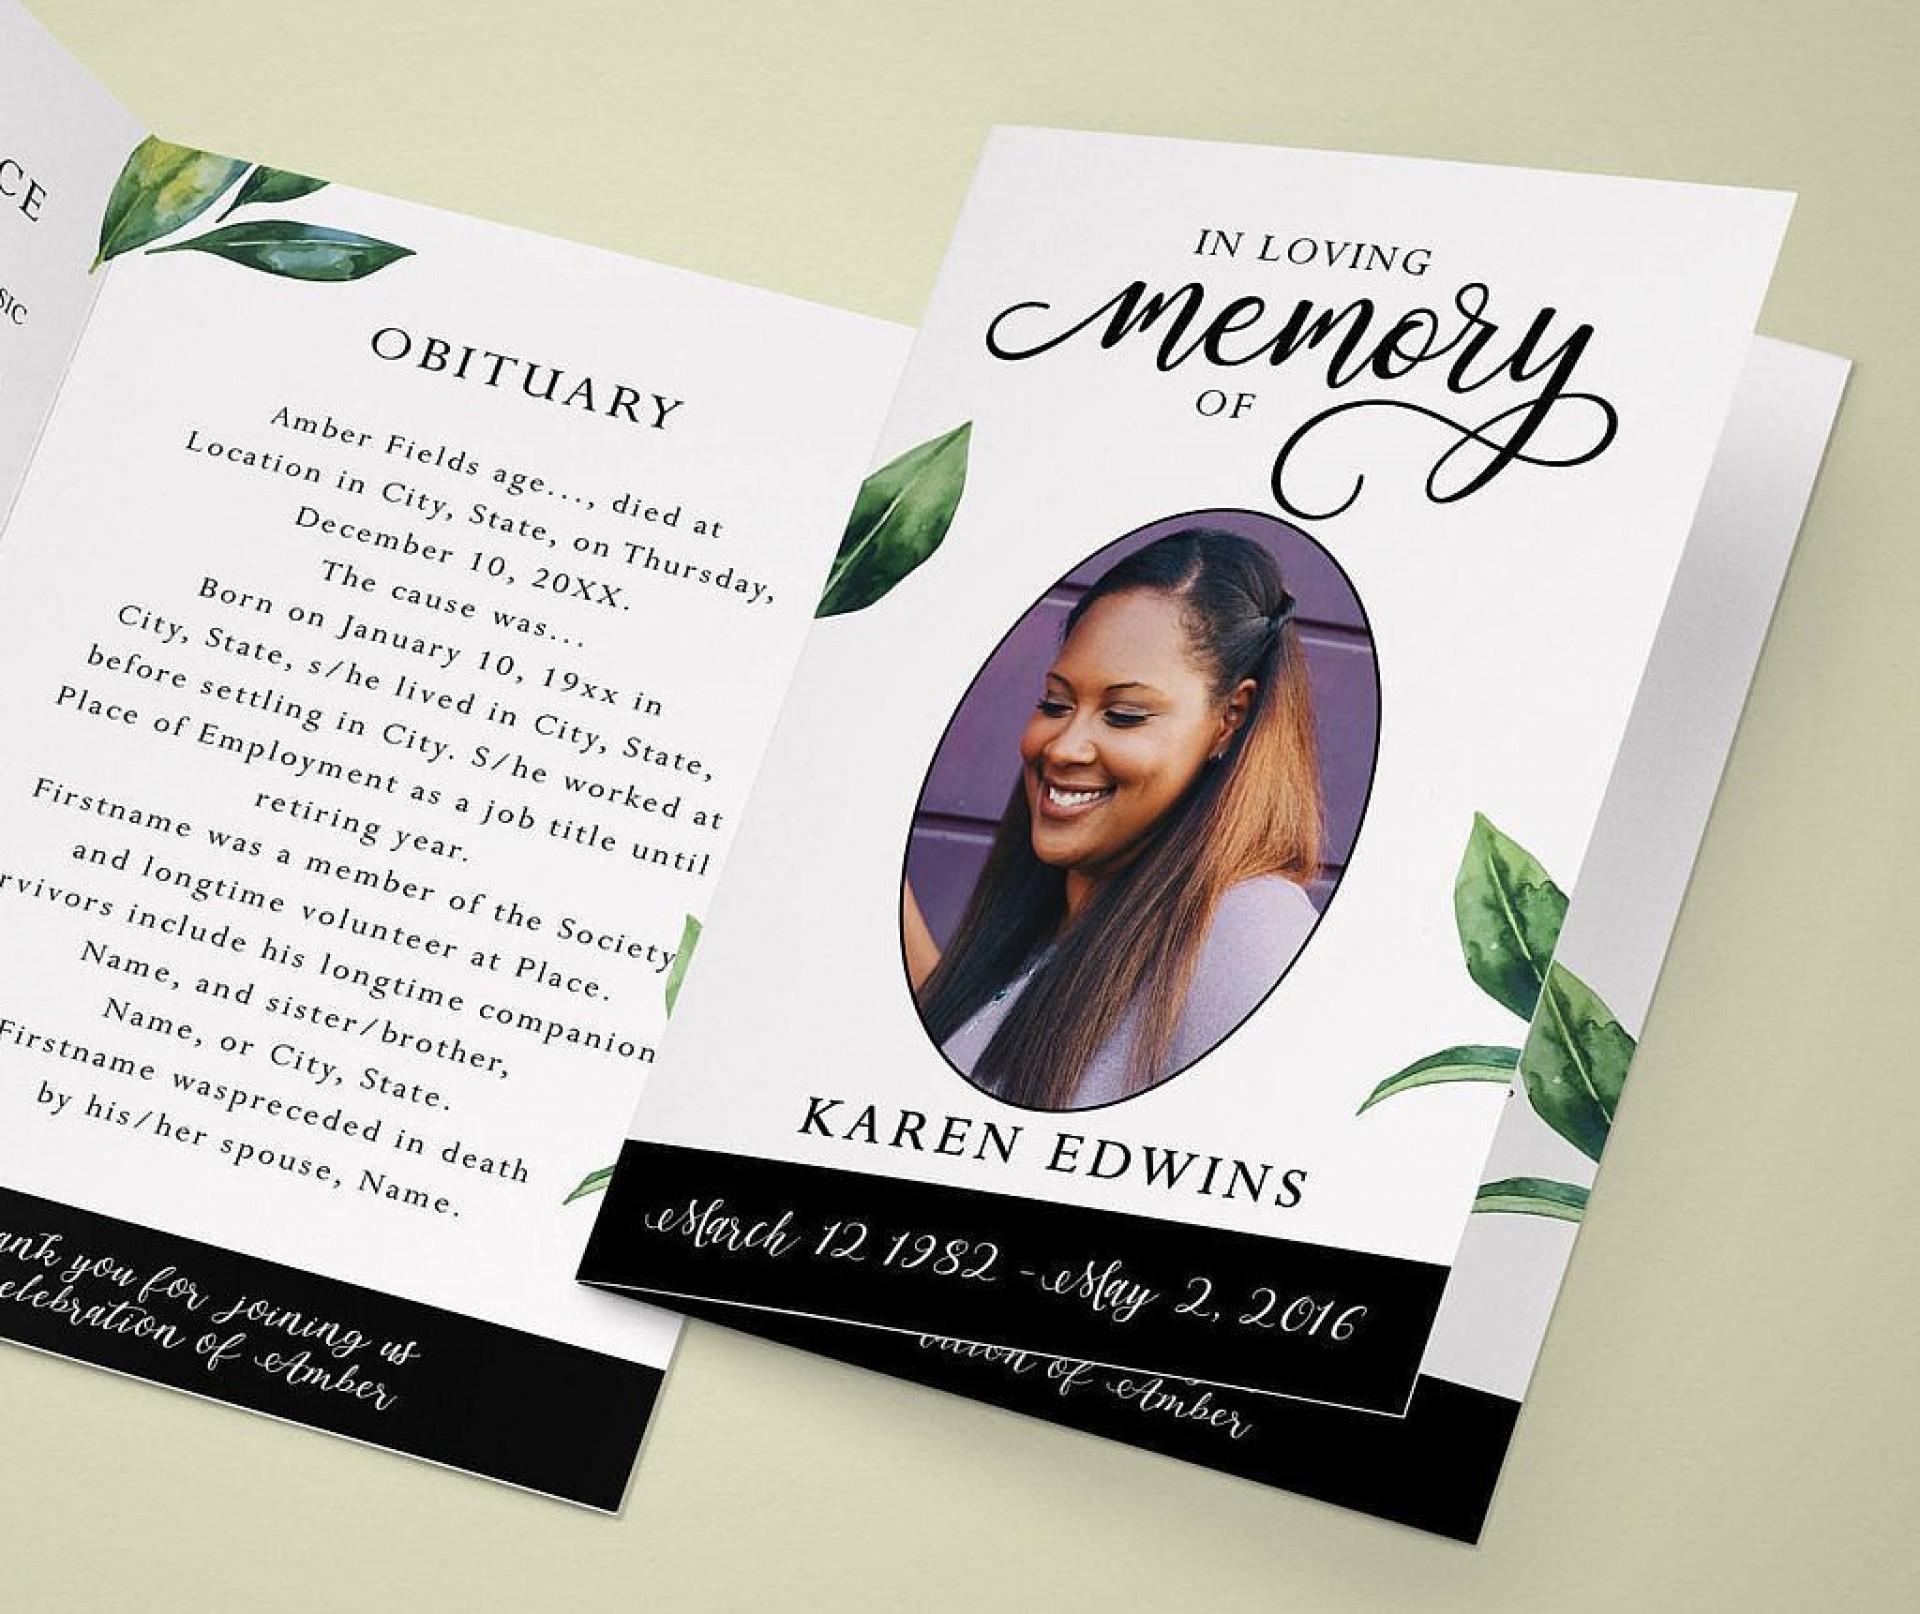 003 Surprising In Loving Memory Template Inspiration  Free Download Card Bookmark1920